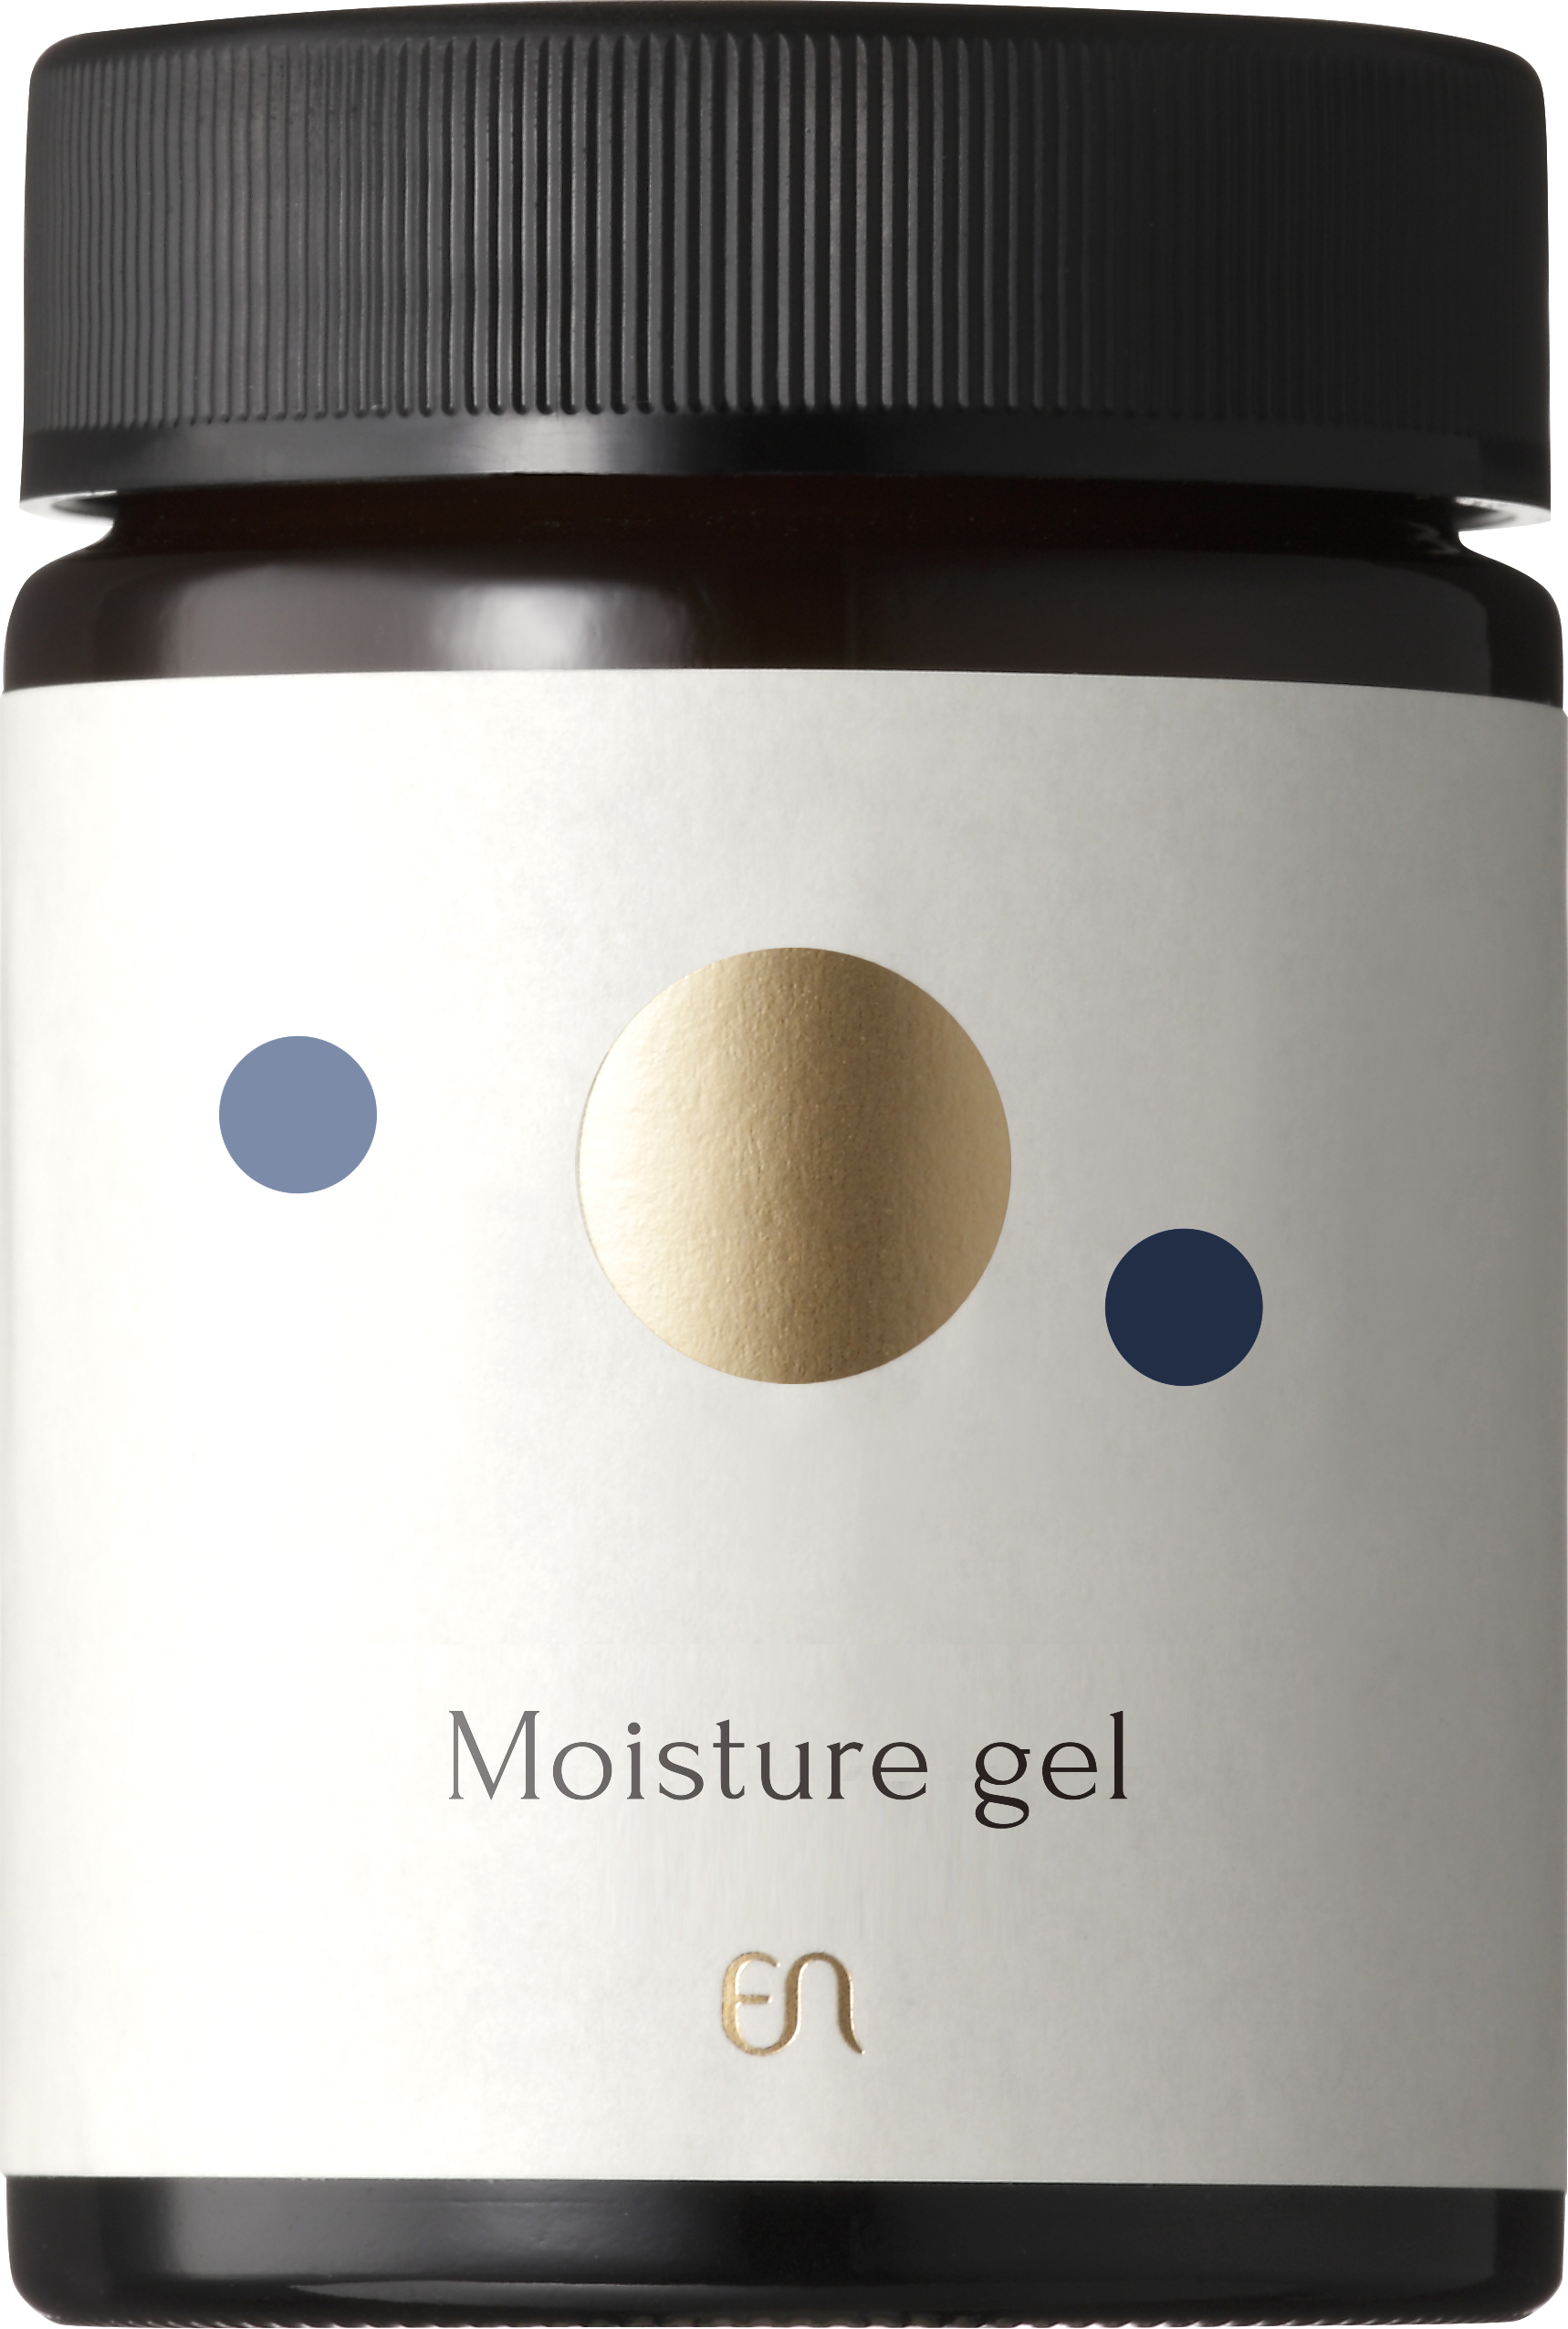 moisture_gel.jpg